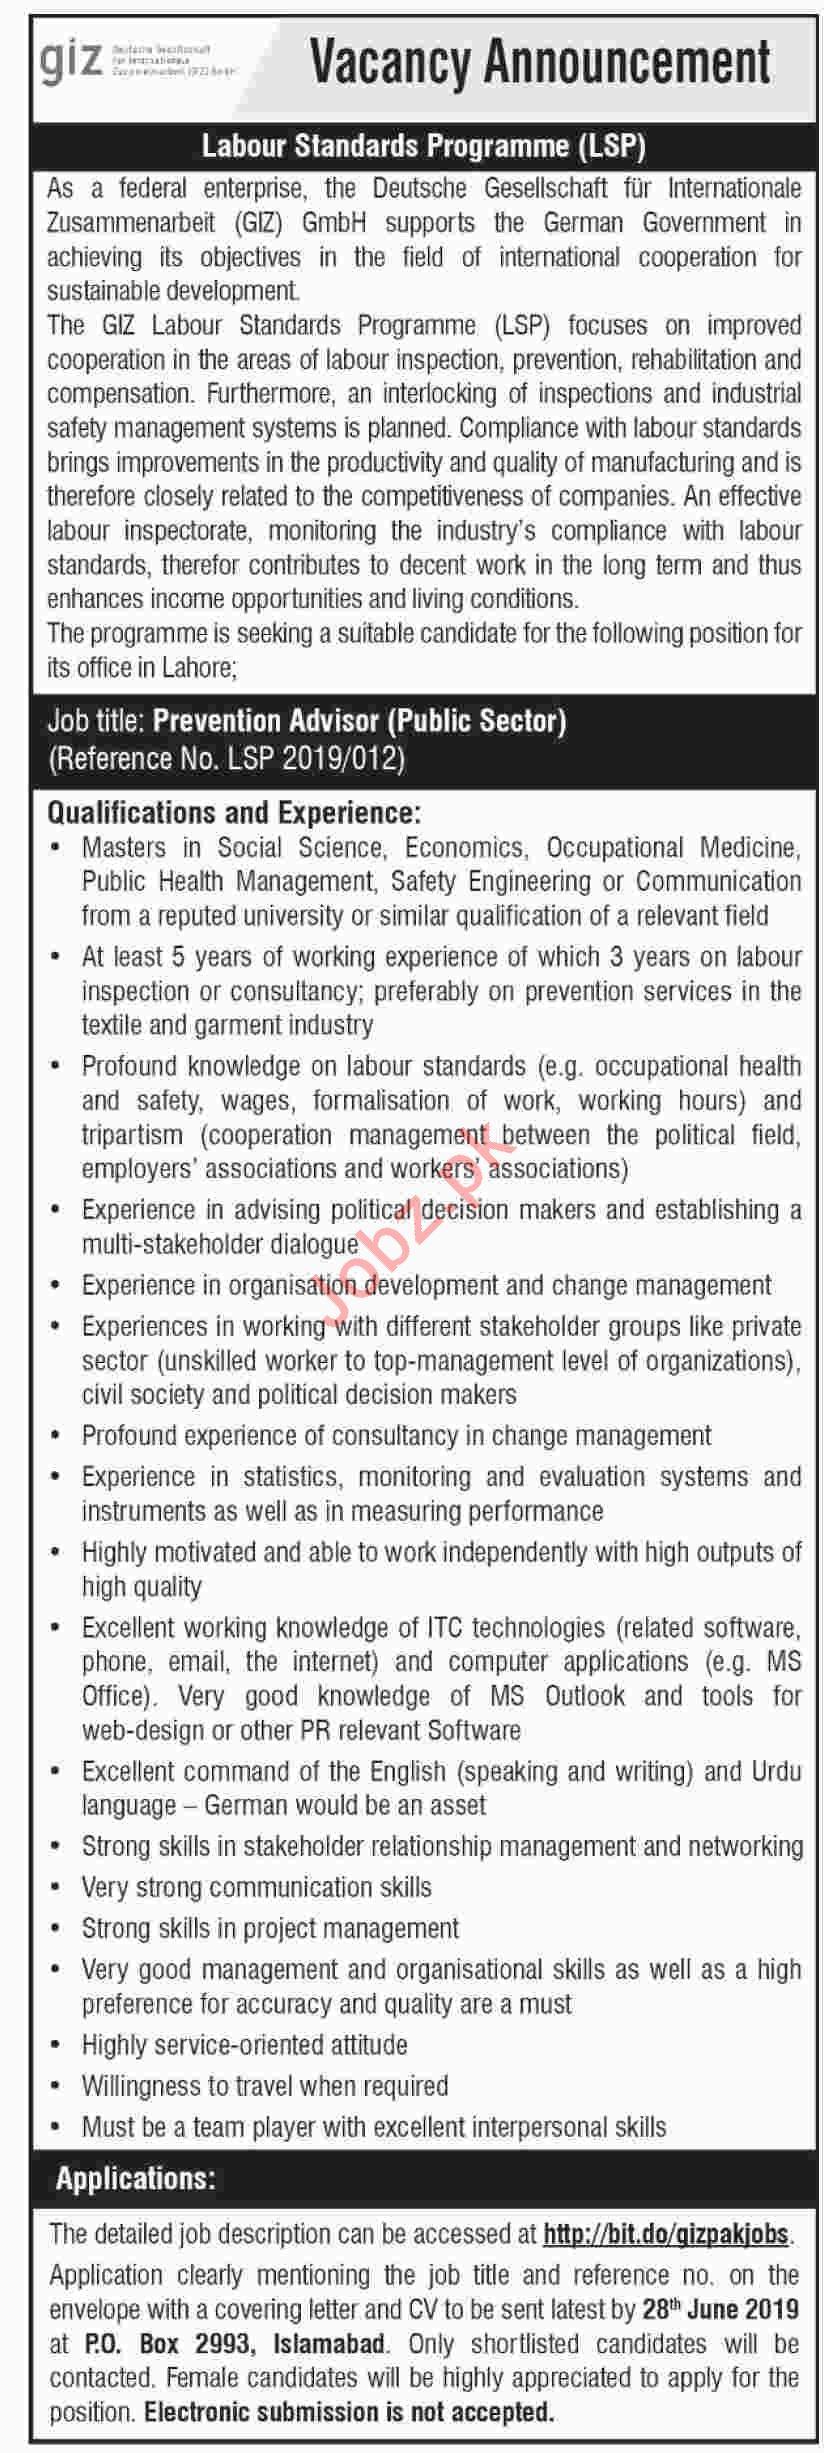 GIZ Pakistan NGO Labour Standards Programme LSP Job 2019